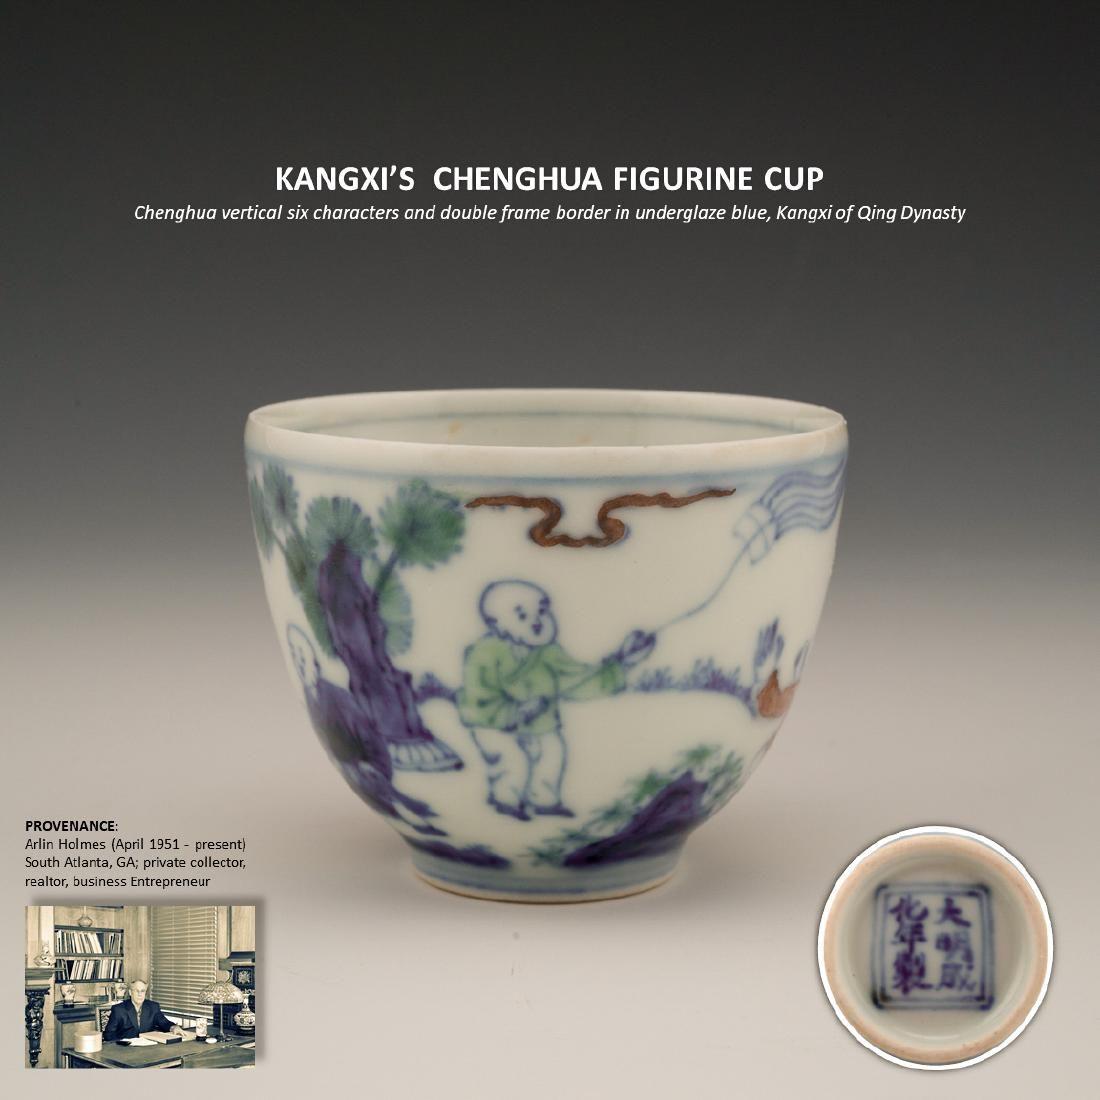 KANGXI'S CHENGHUA FIGURINE CUP